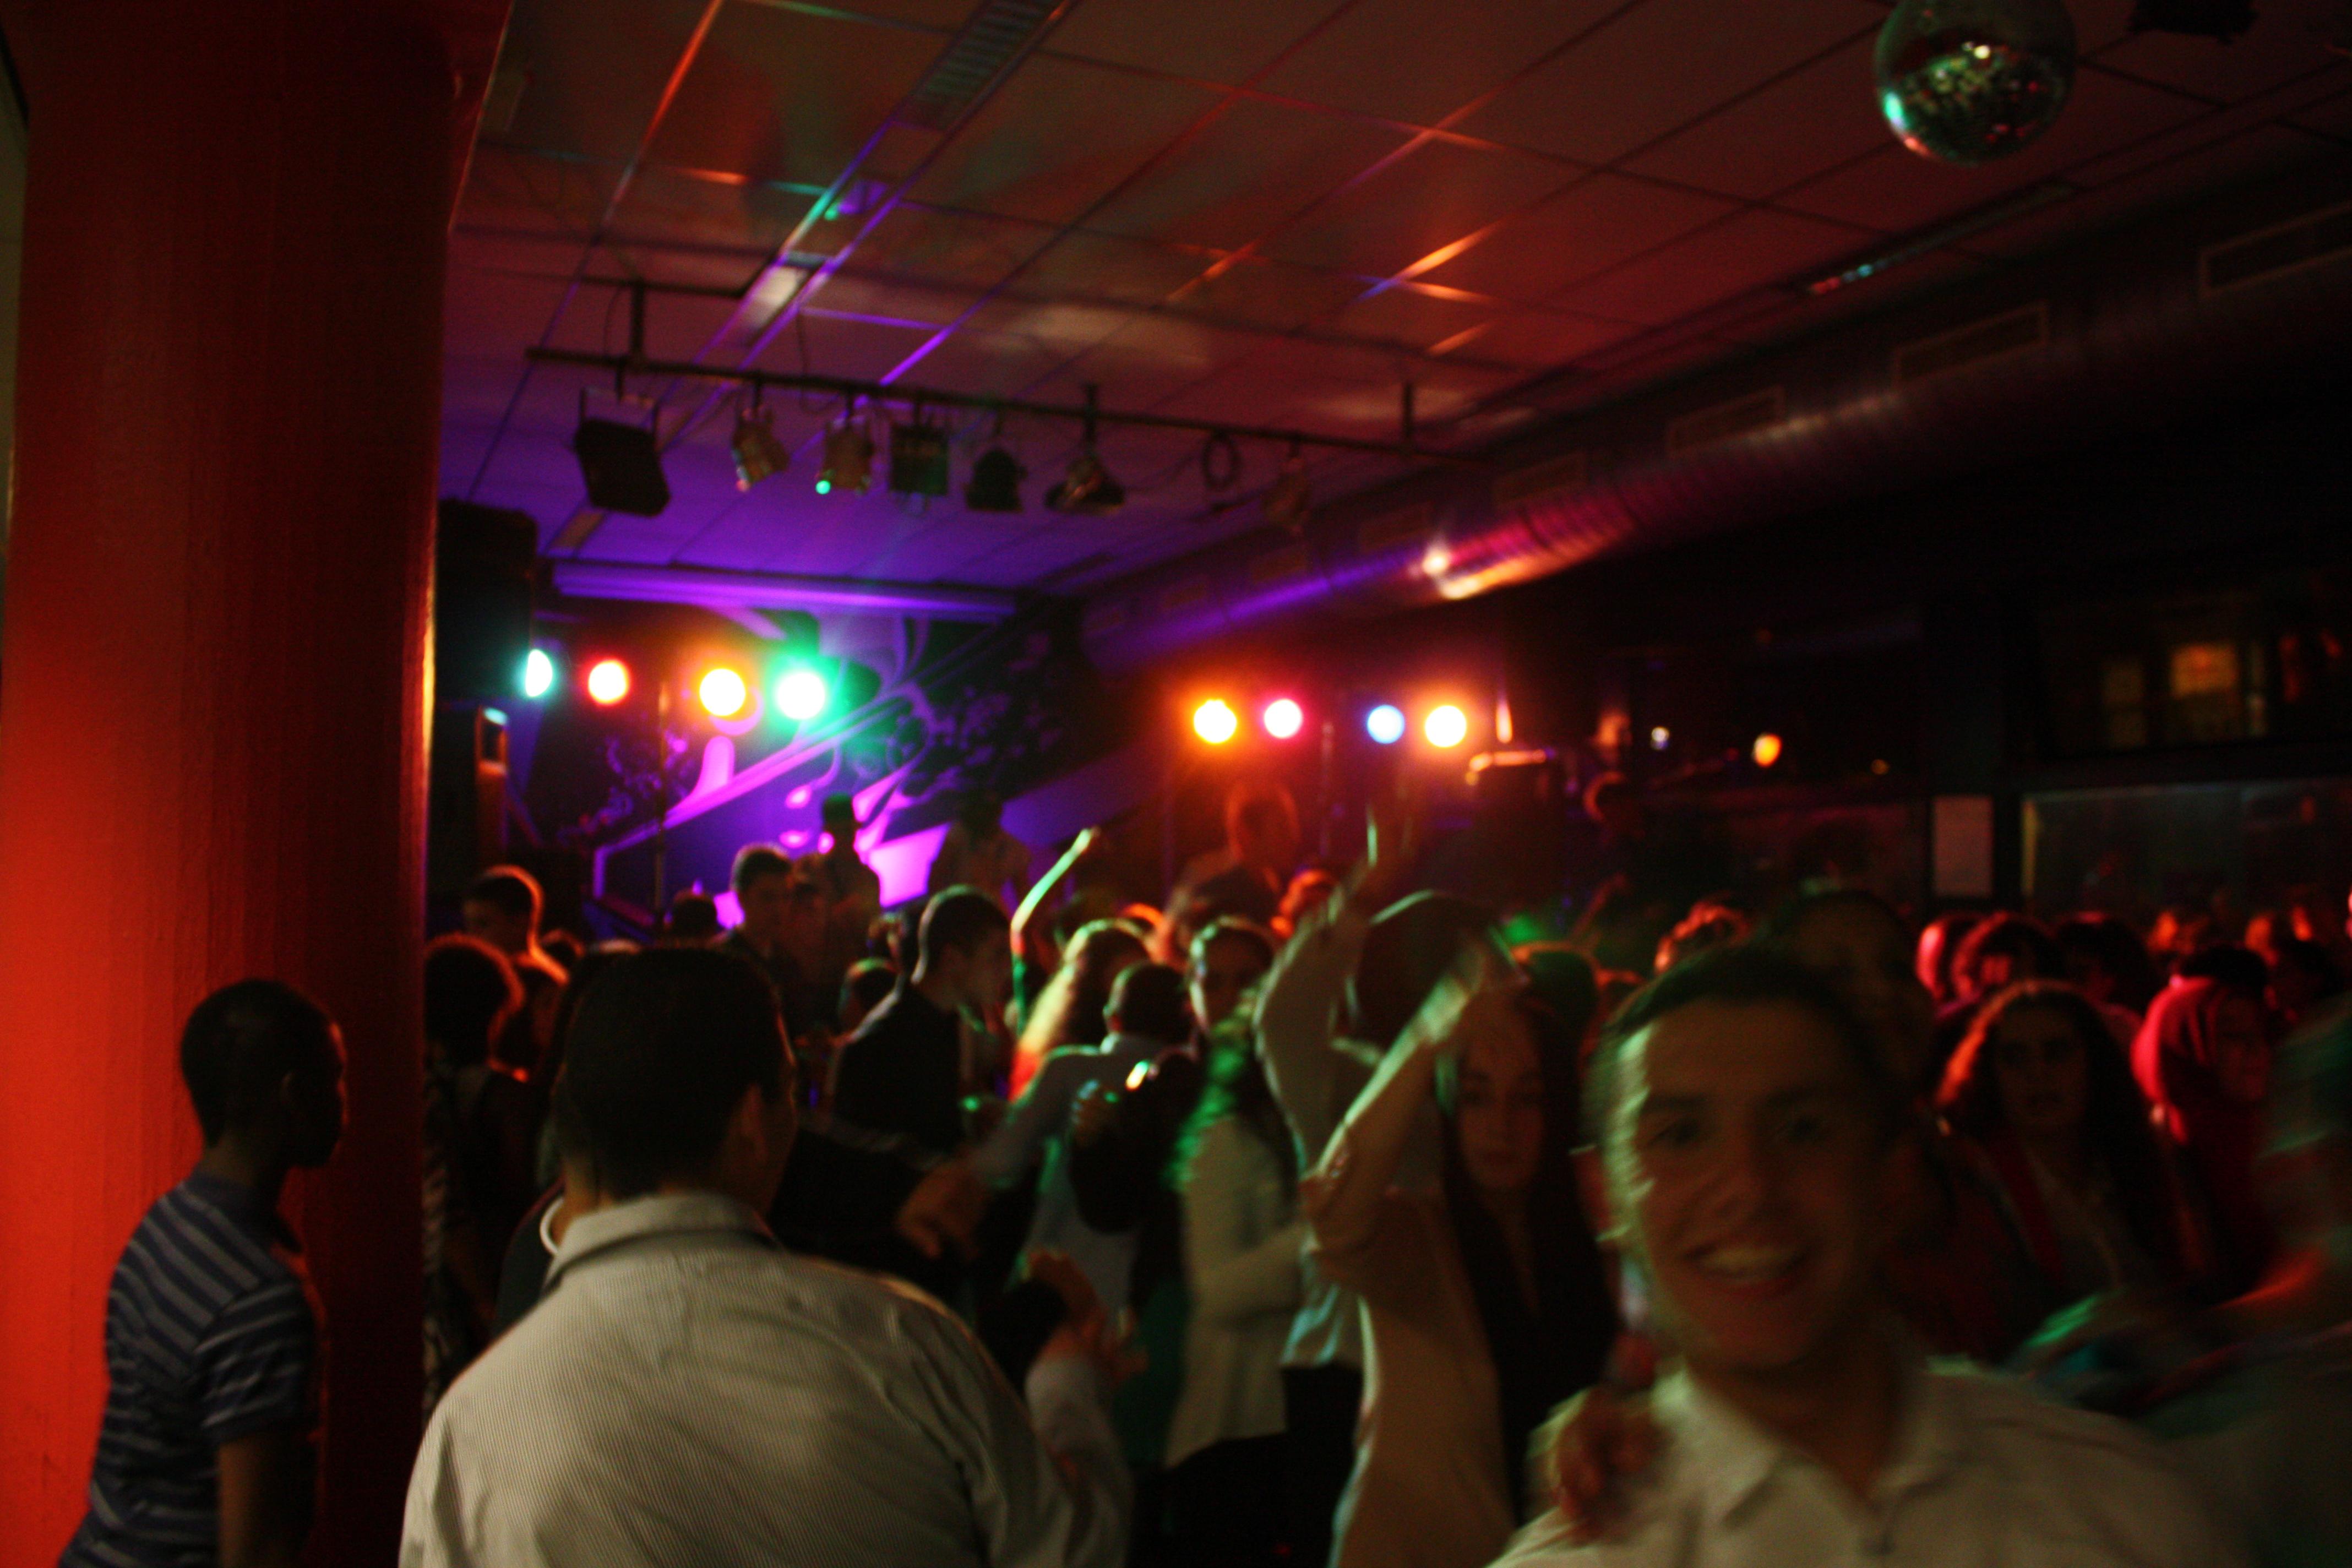 DiscoCrew Drive-in Show Den Haag verzorging schoolfeest licht geluid feestgangers carnaval